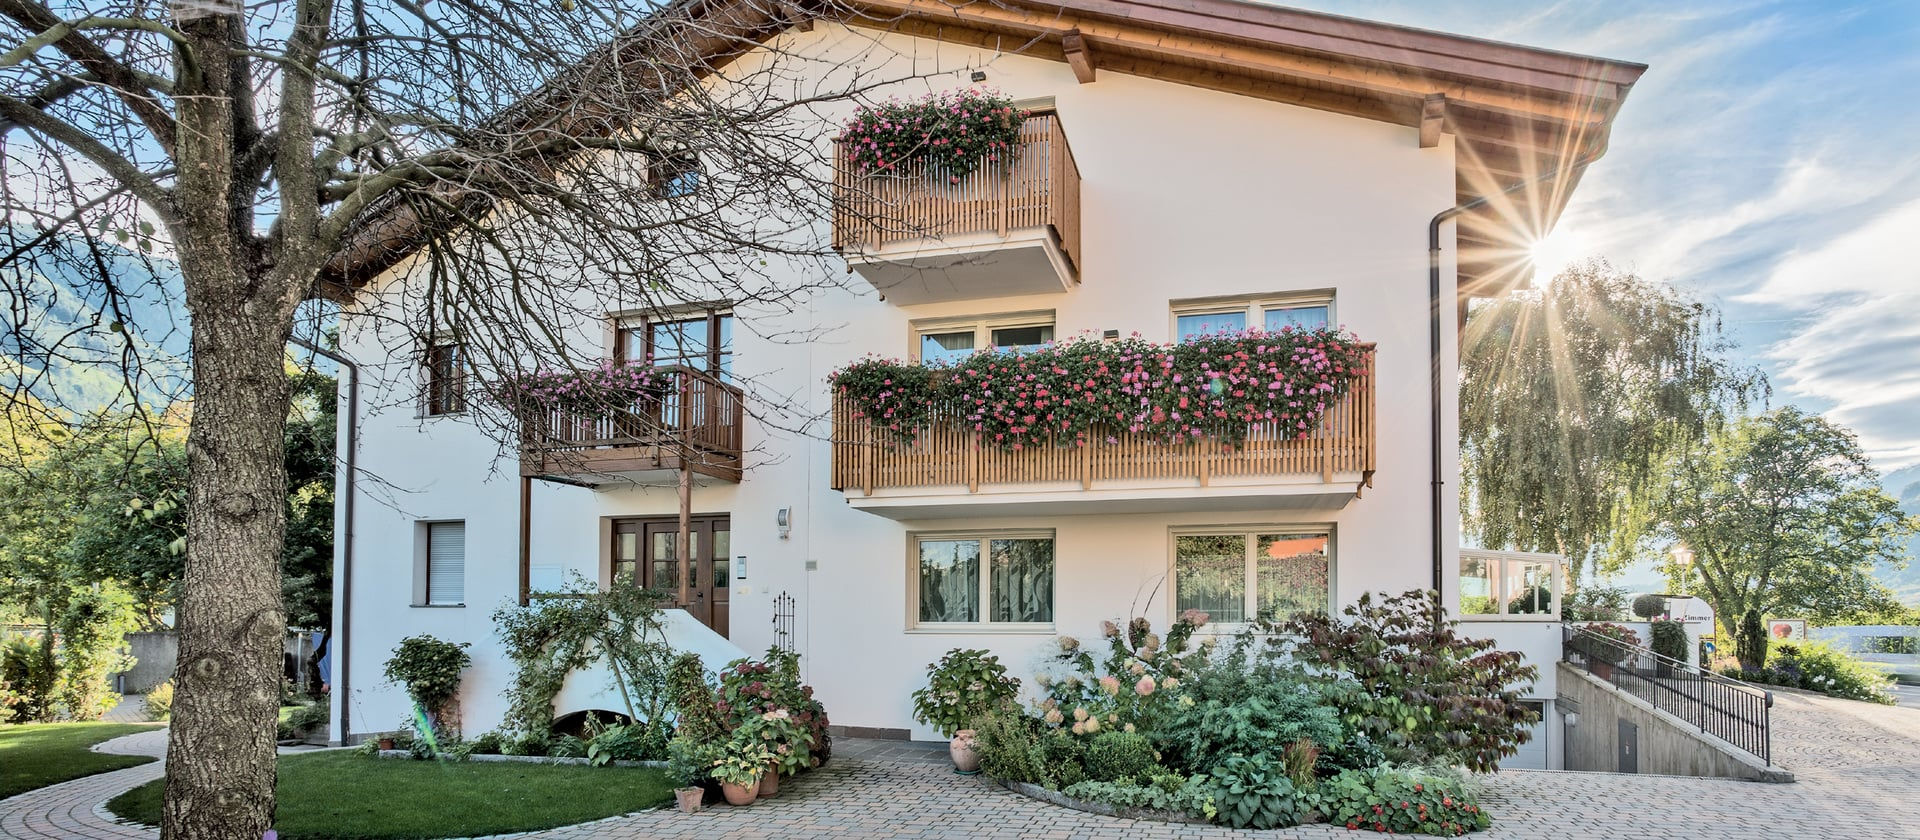 Hôtel Wagnerhof à Rabland